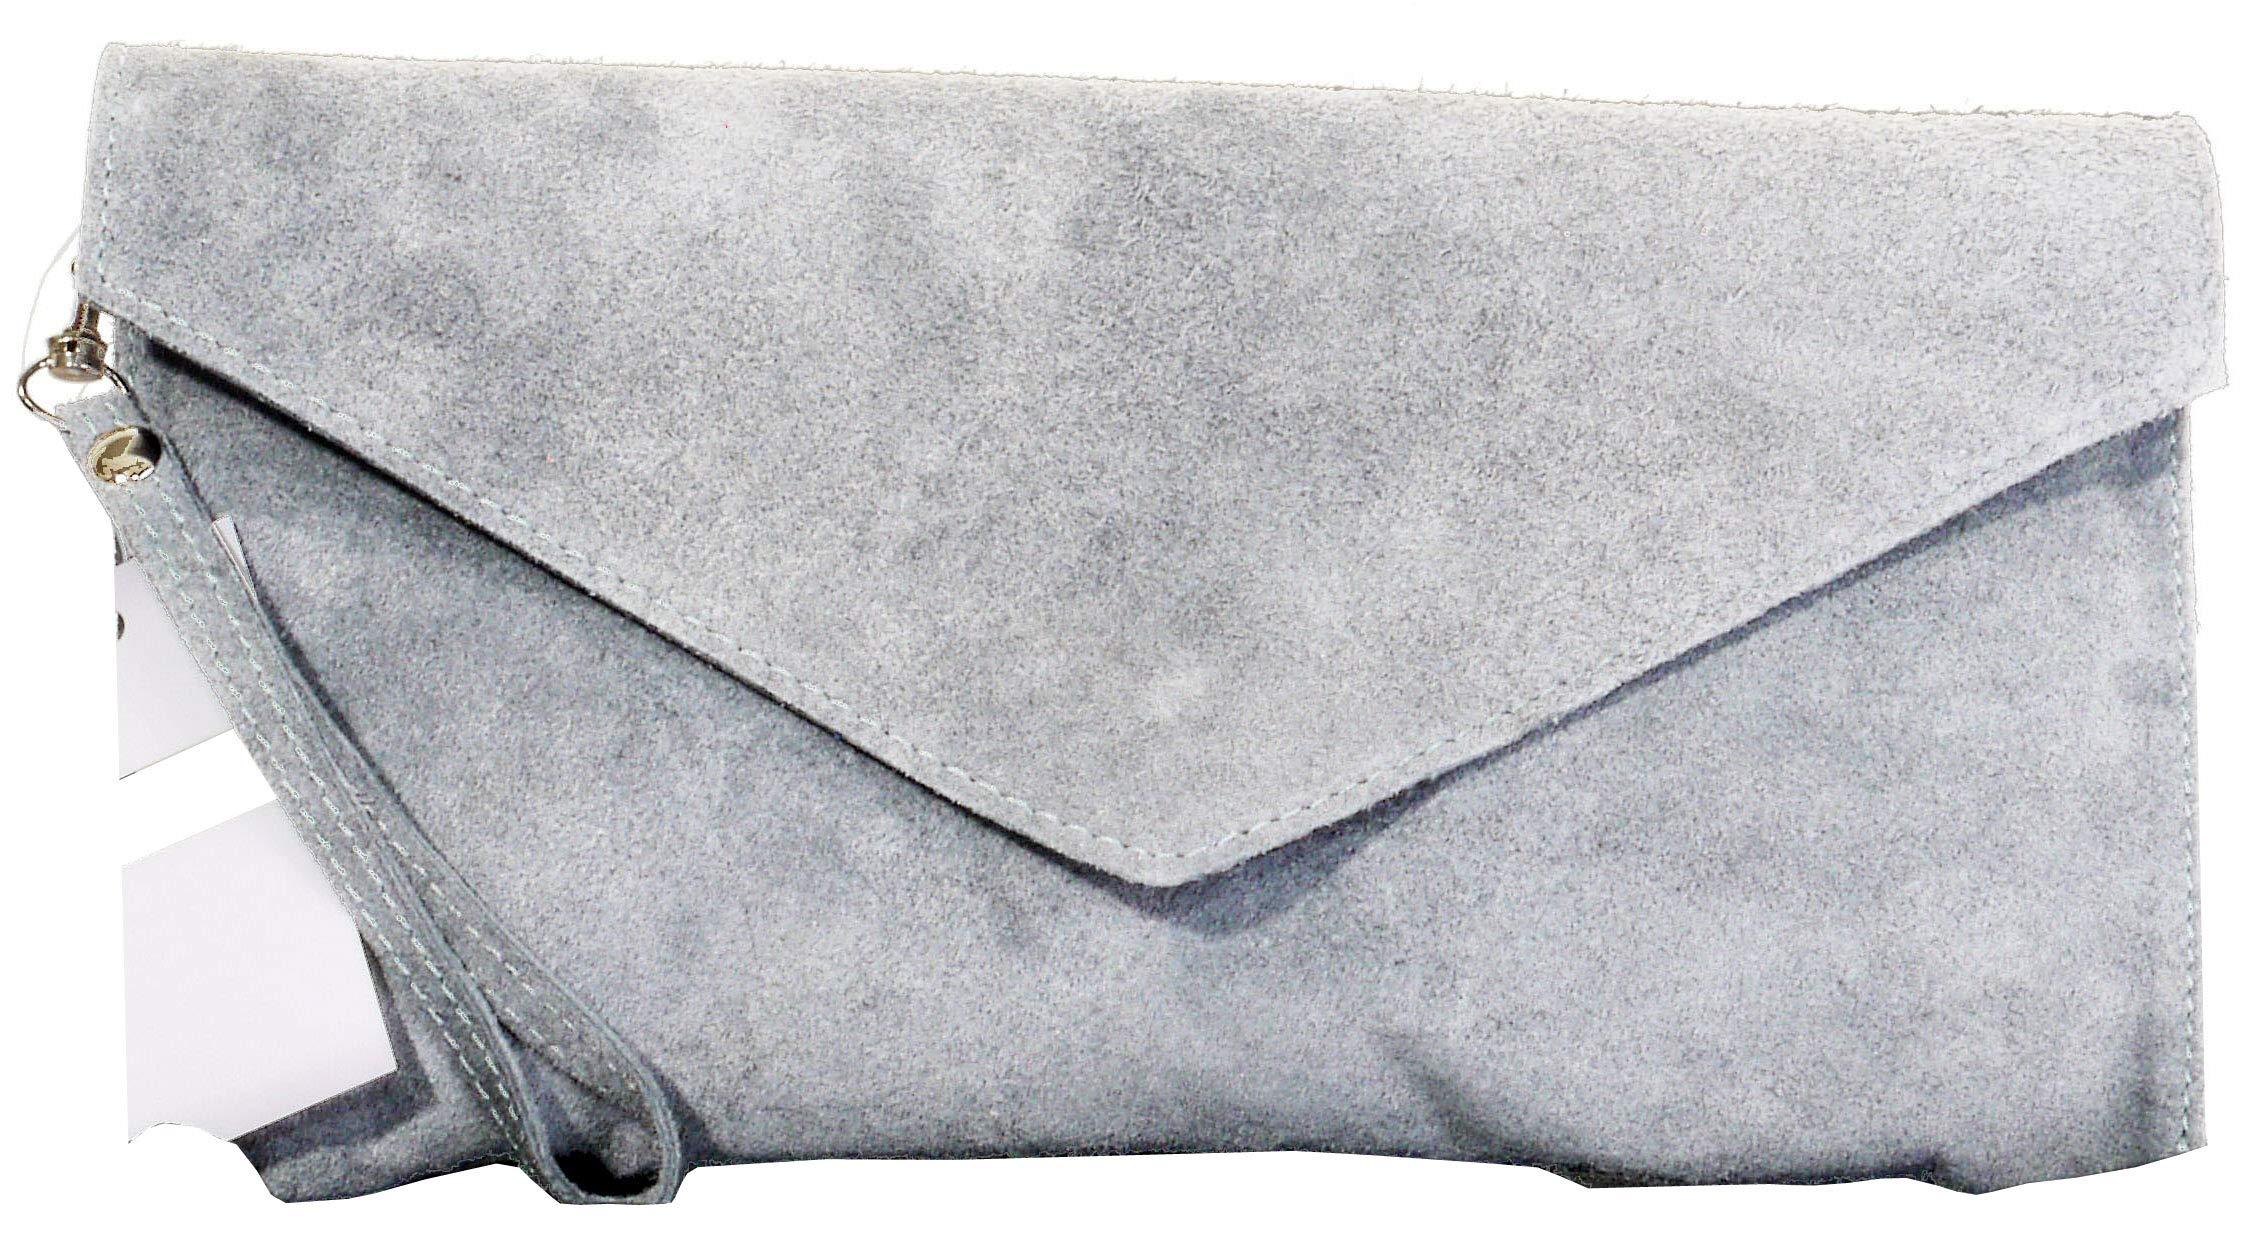 Italian Suede Leather Hand Made Light Grey Envelope Design Clutch, Wrist, Shoulder or Crossbody Bag. Includes a Branded Protective Storage Bag